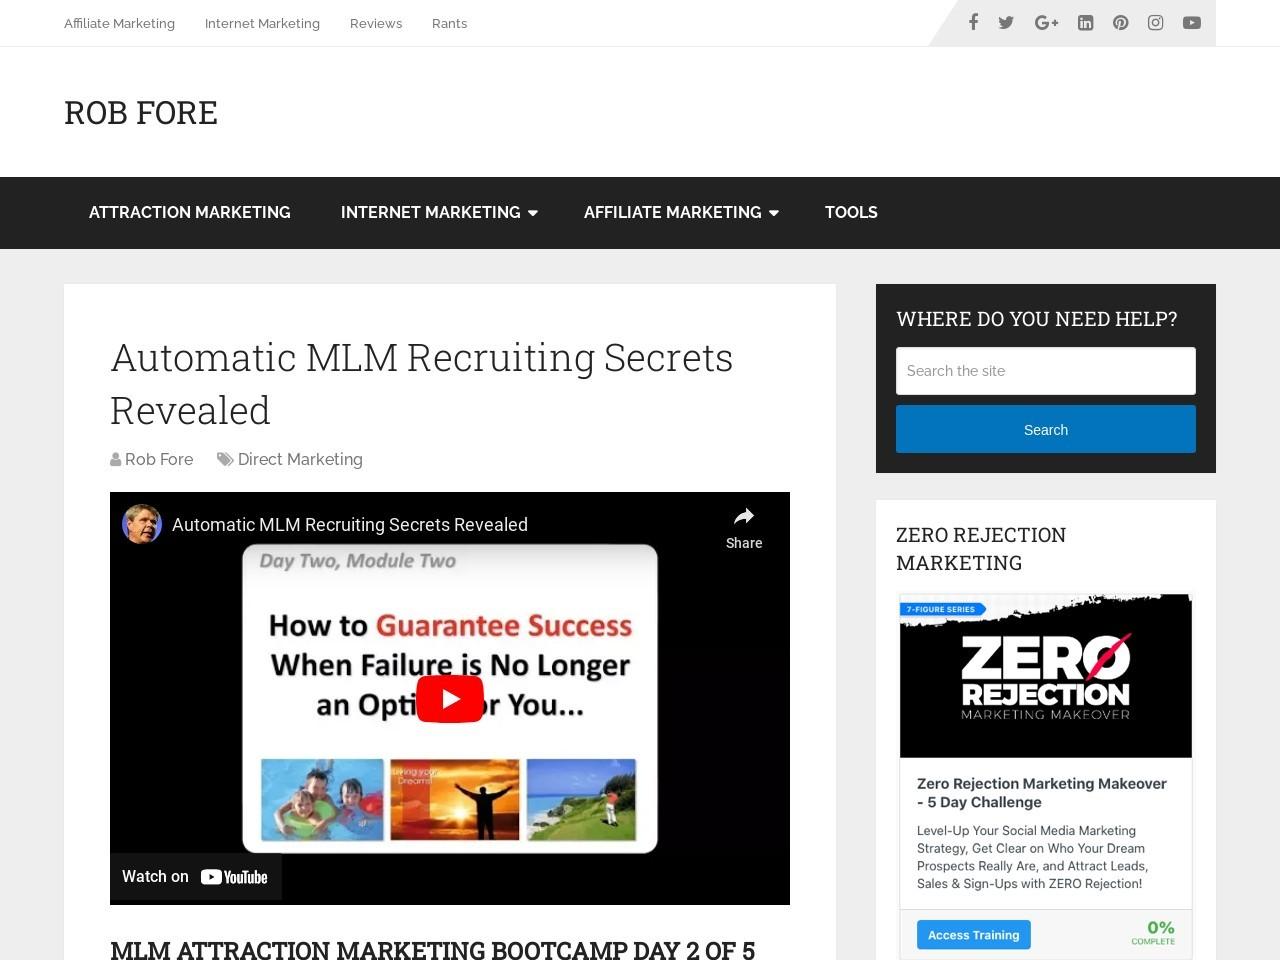 Automatic MLM Recruiting Secrets Revealed